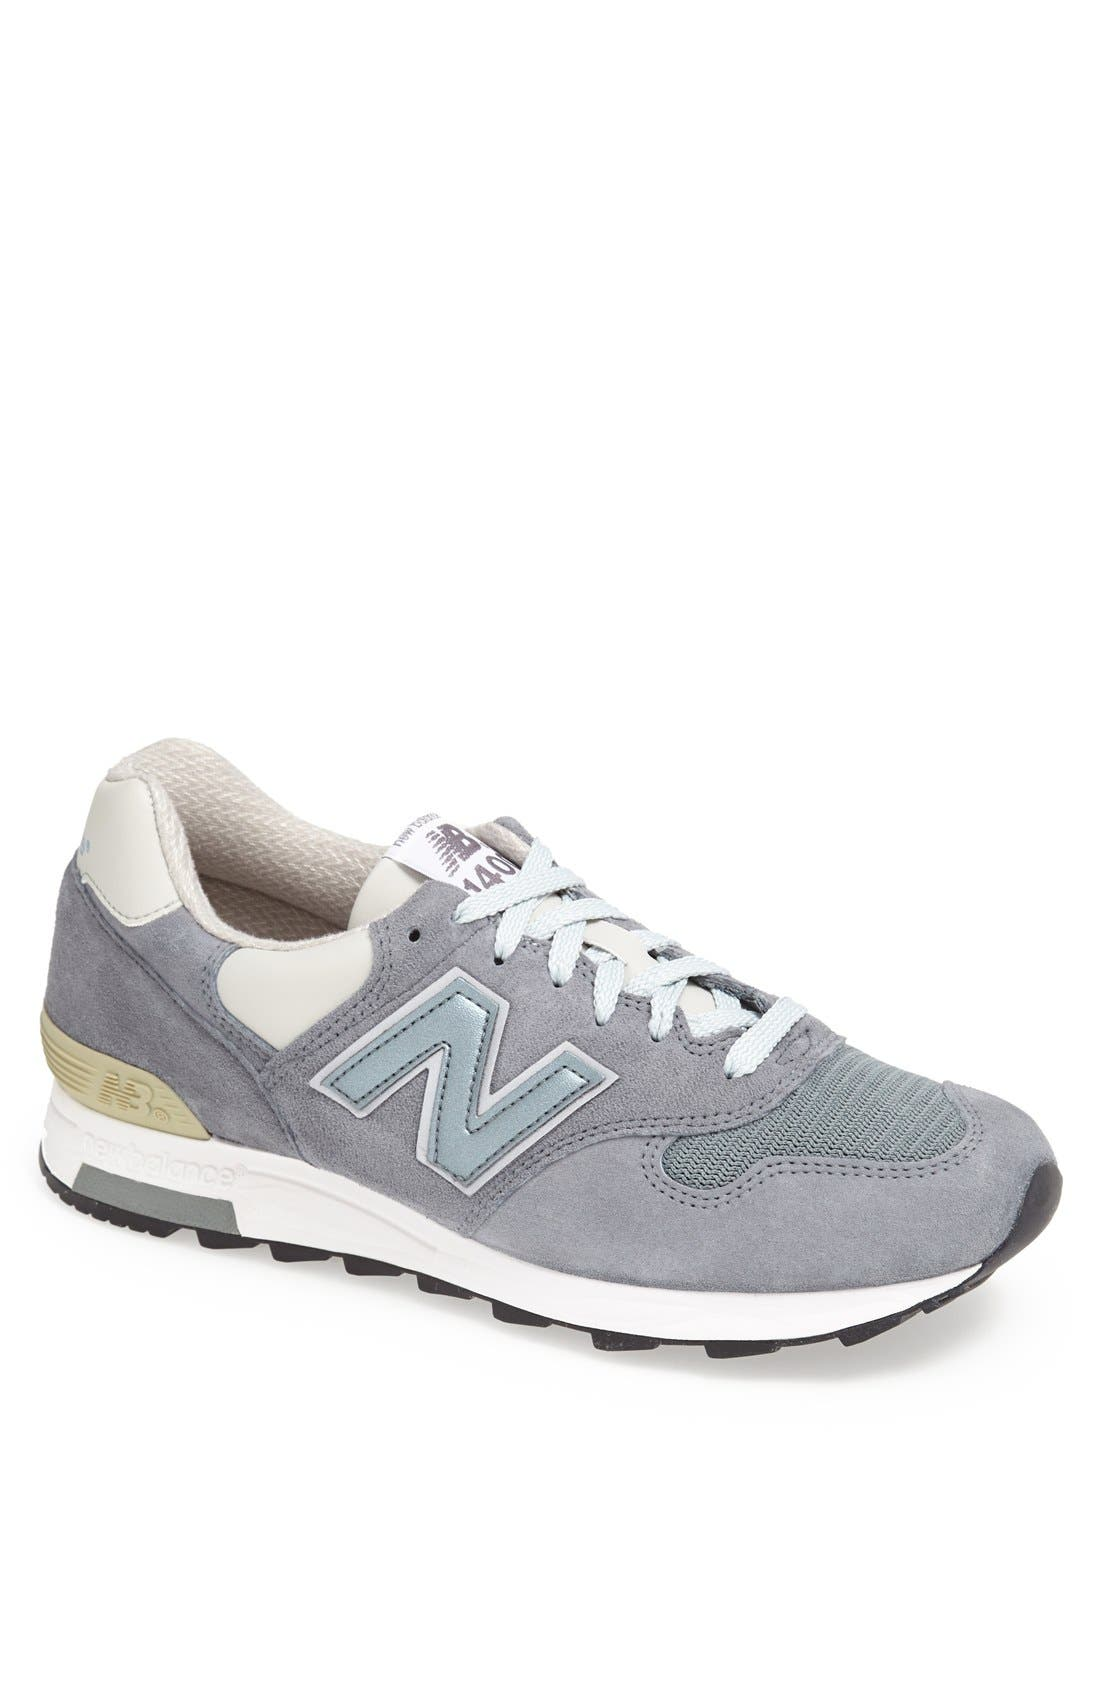 Main Image - New Balance '1400' Suede Running Shoe (Men)